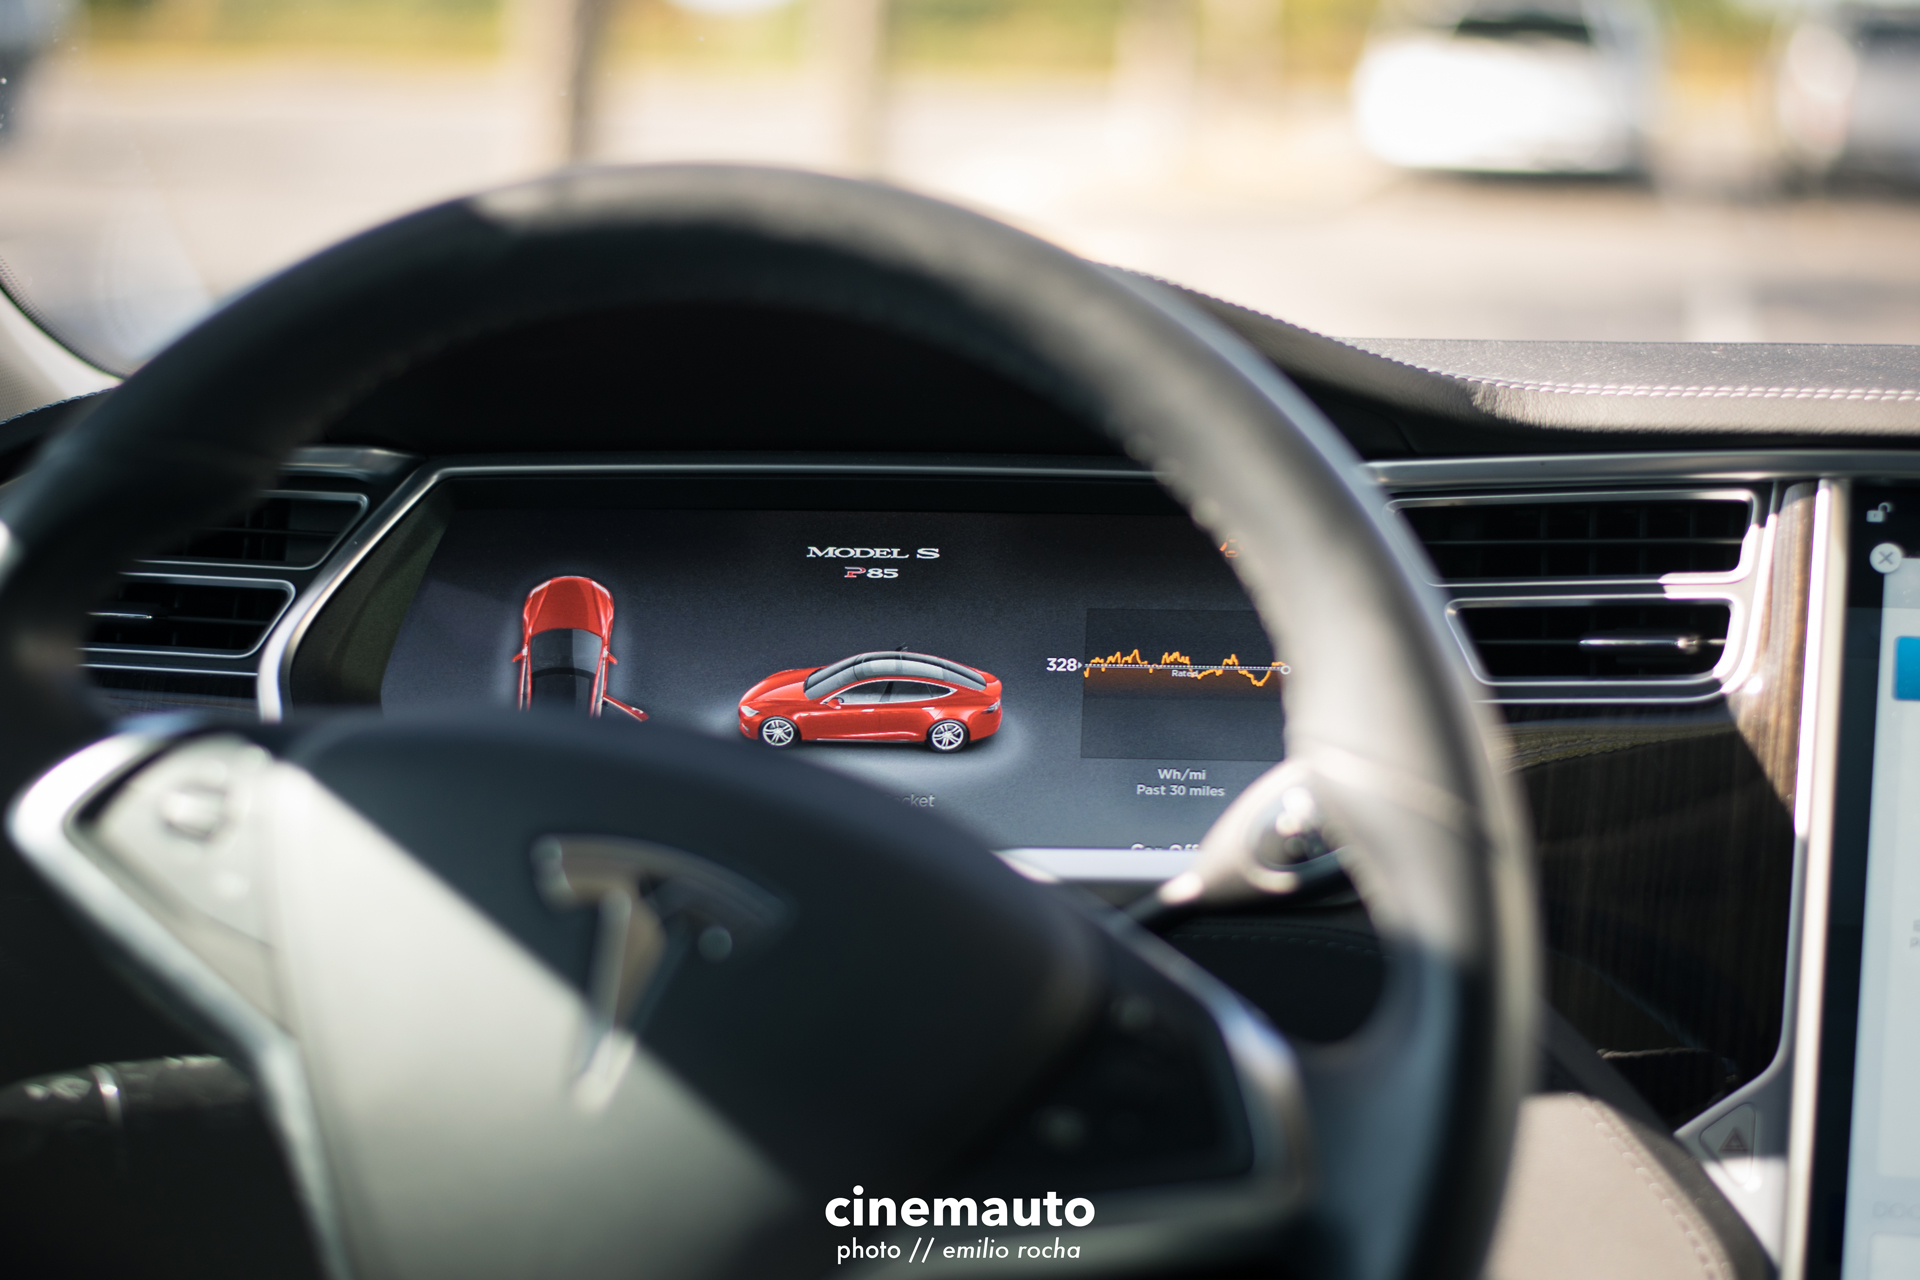 TeslaCinemauto-19.jpg